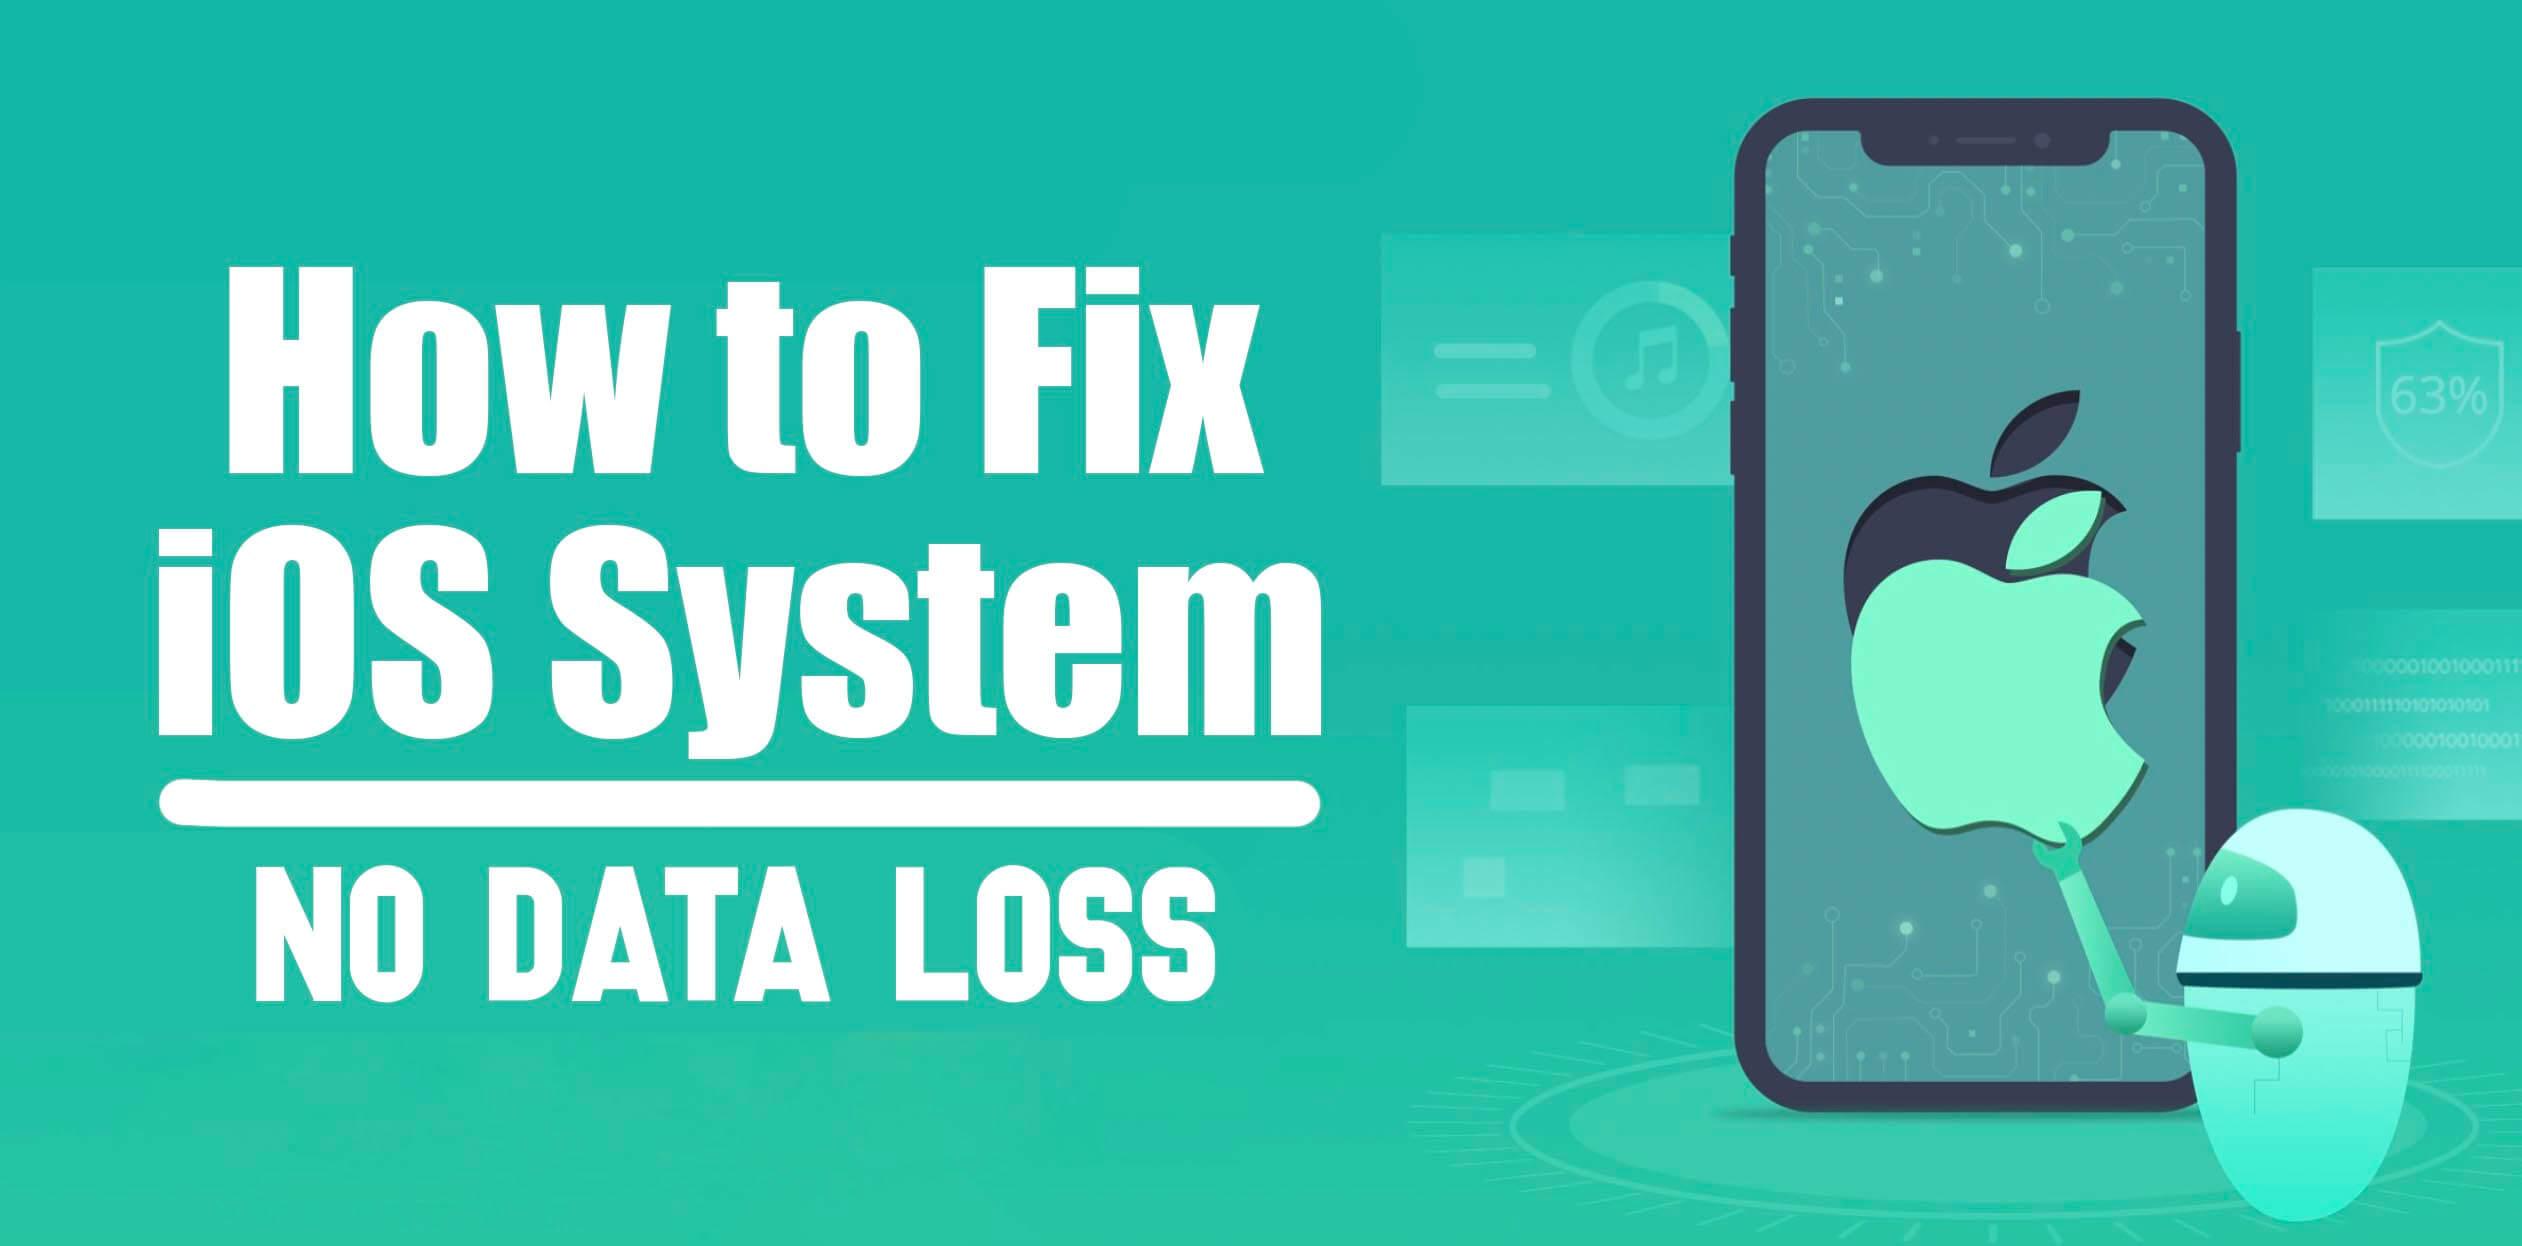 How to Fix iOS System (No Data Loss) - Joyoshare UltFix